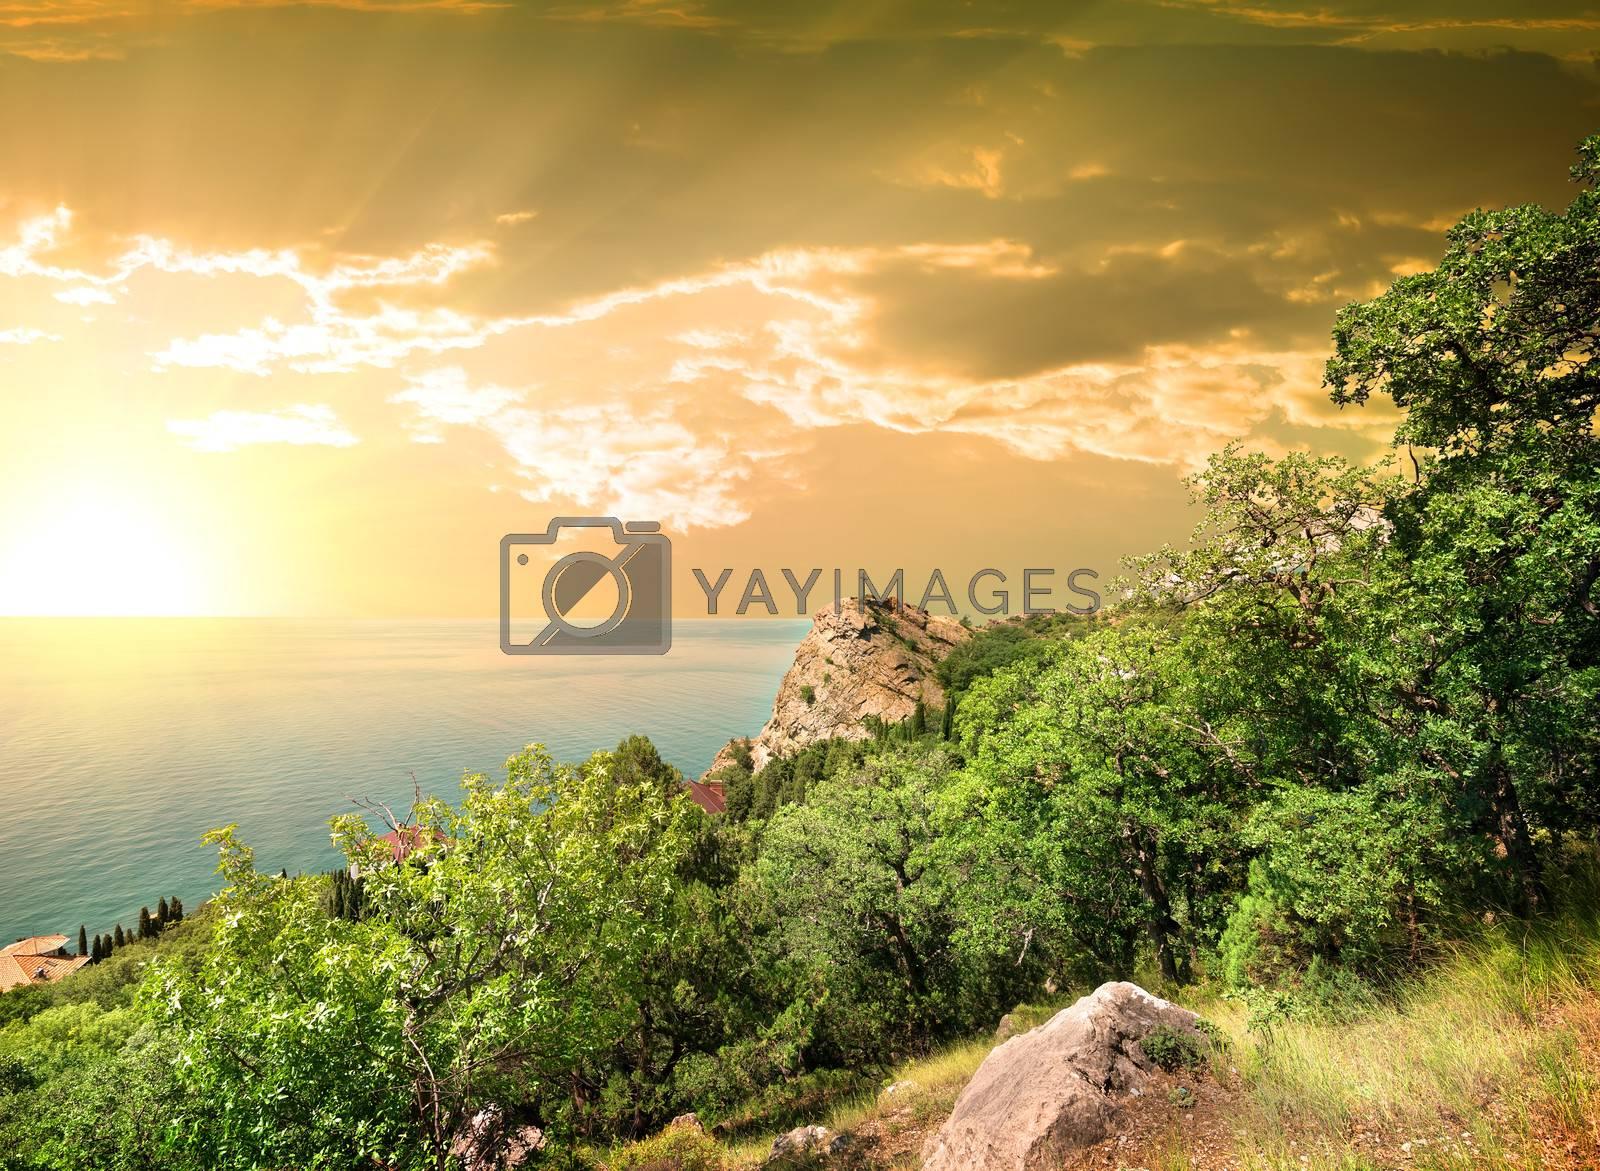 Mountain Iphigenia at dawn in Kastropol in Crimea